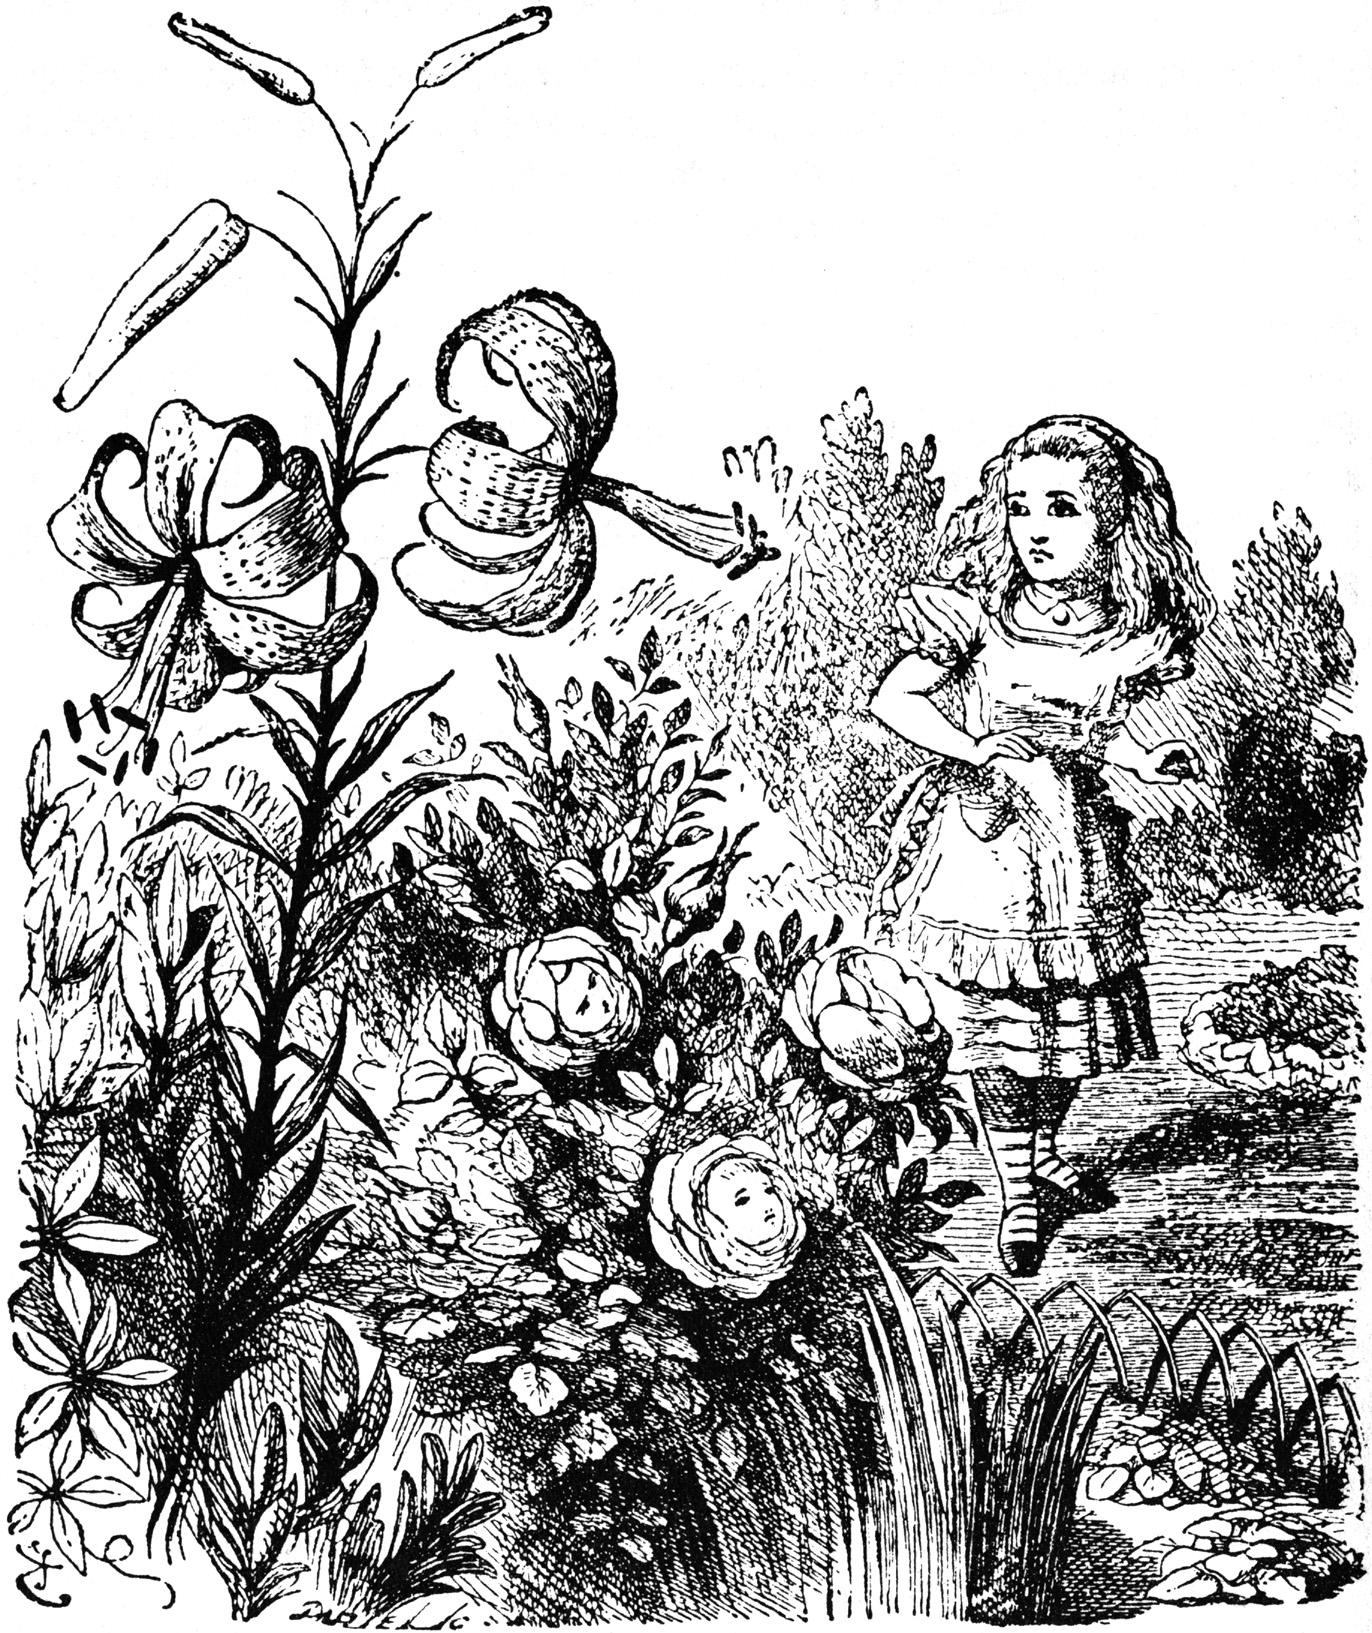 Drawn alice in wonderland old Looking meeting Alice net the